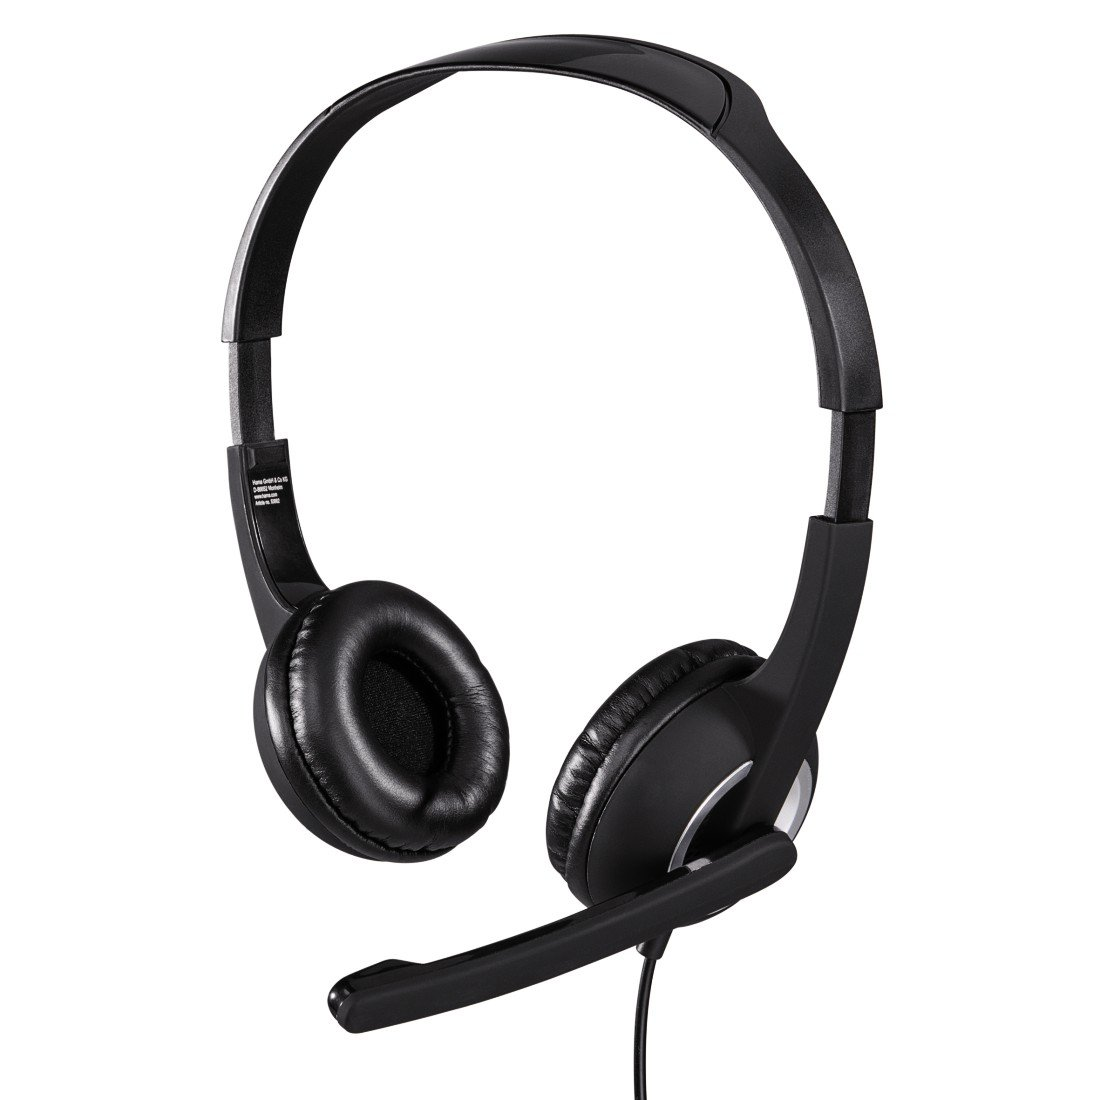 Hama PC Headset Essential HS 300 mit Mikrofon (ultra leicht, On-Ear, gepolsterte Ohrmuscheln, Stereo, Lautstä rkeregler am Kabel, 2 m Kabellä nge, 3,5 mm Klinke) schwarz 00053982